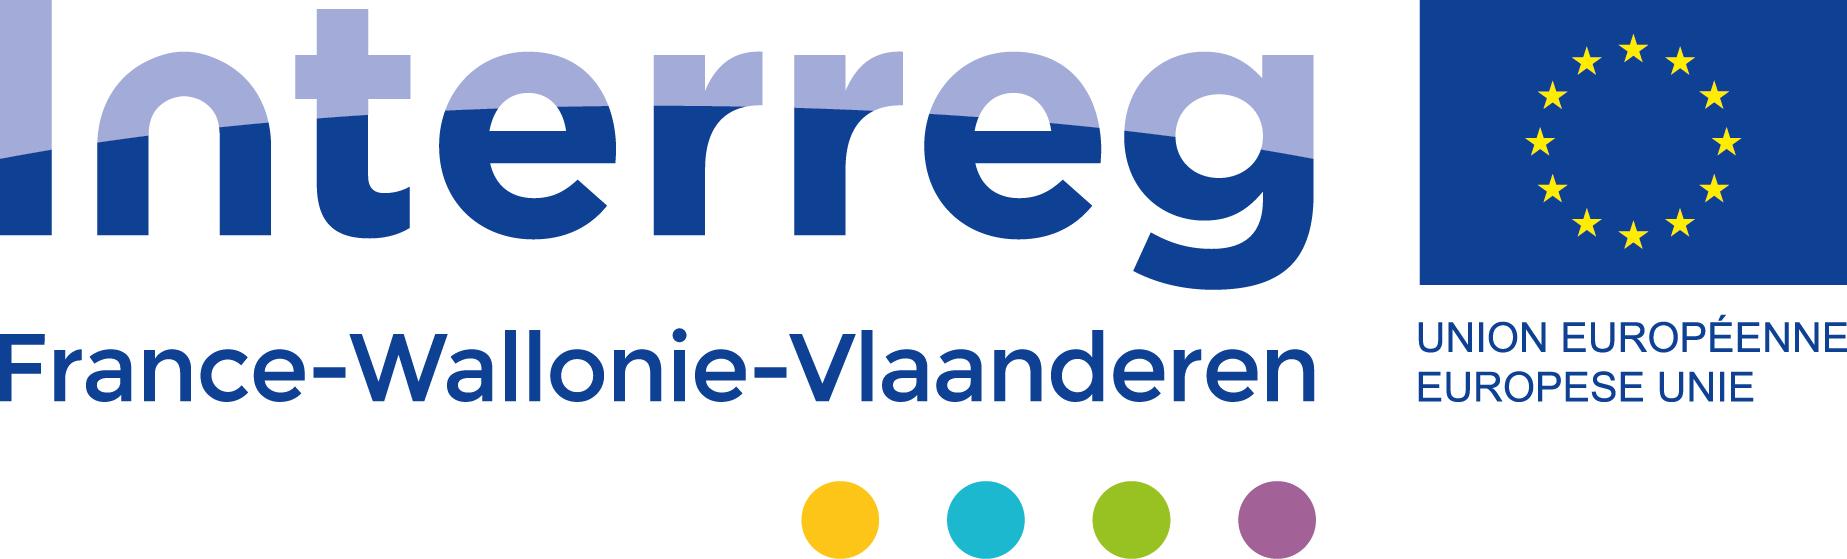 Interreg France-Wallonie-Vlaanderen